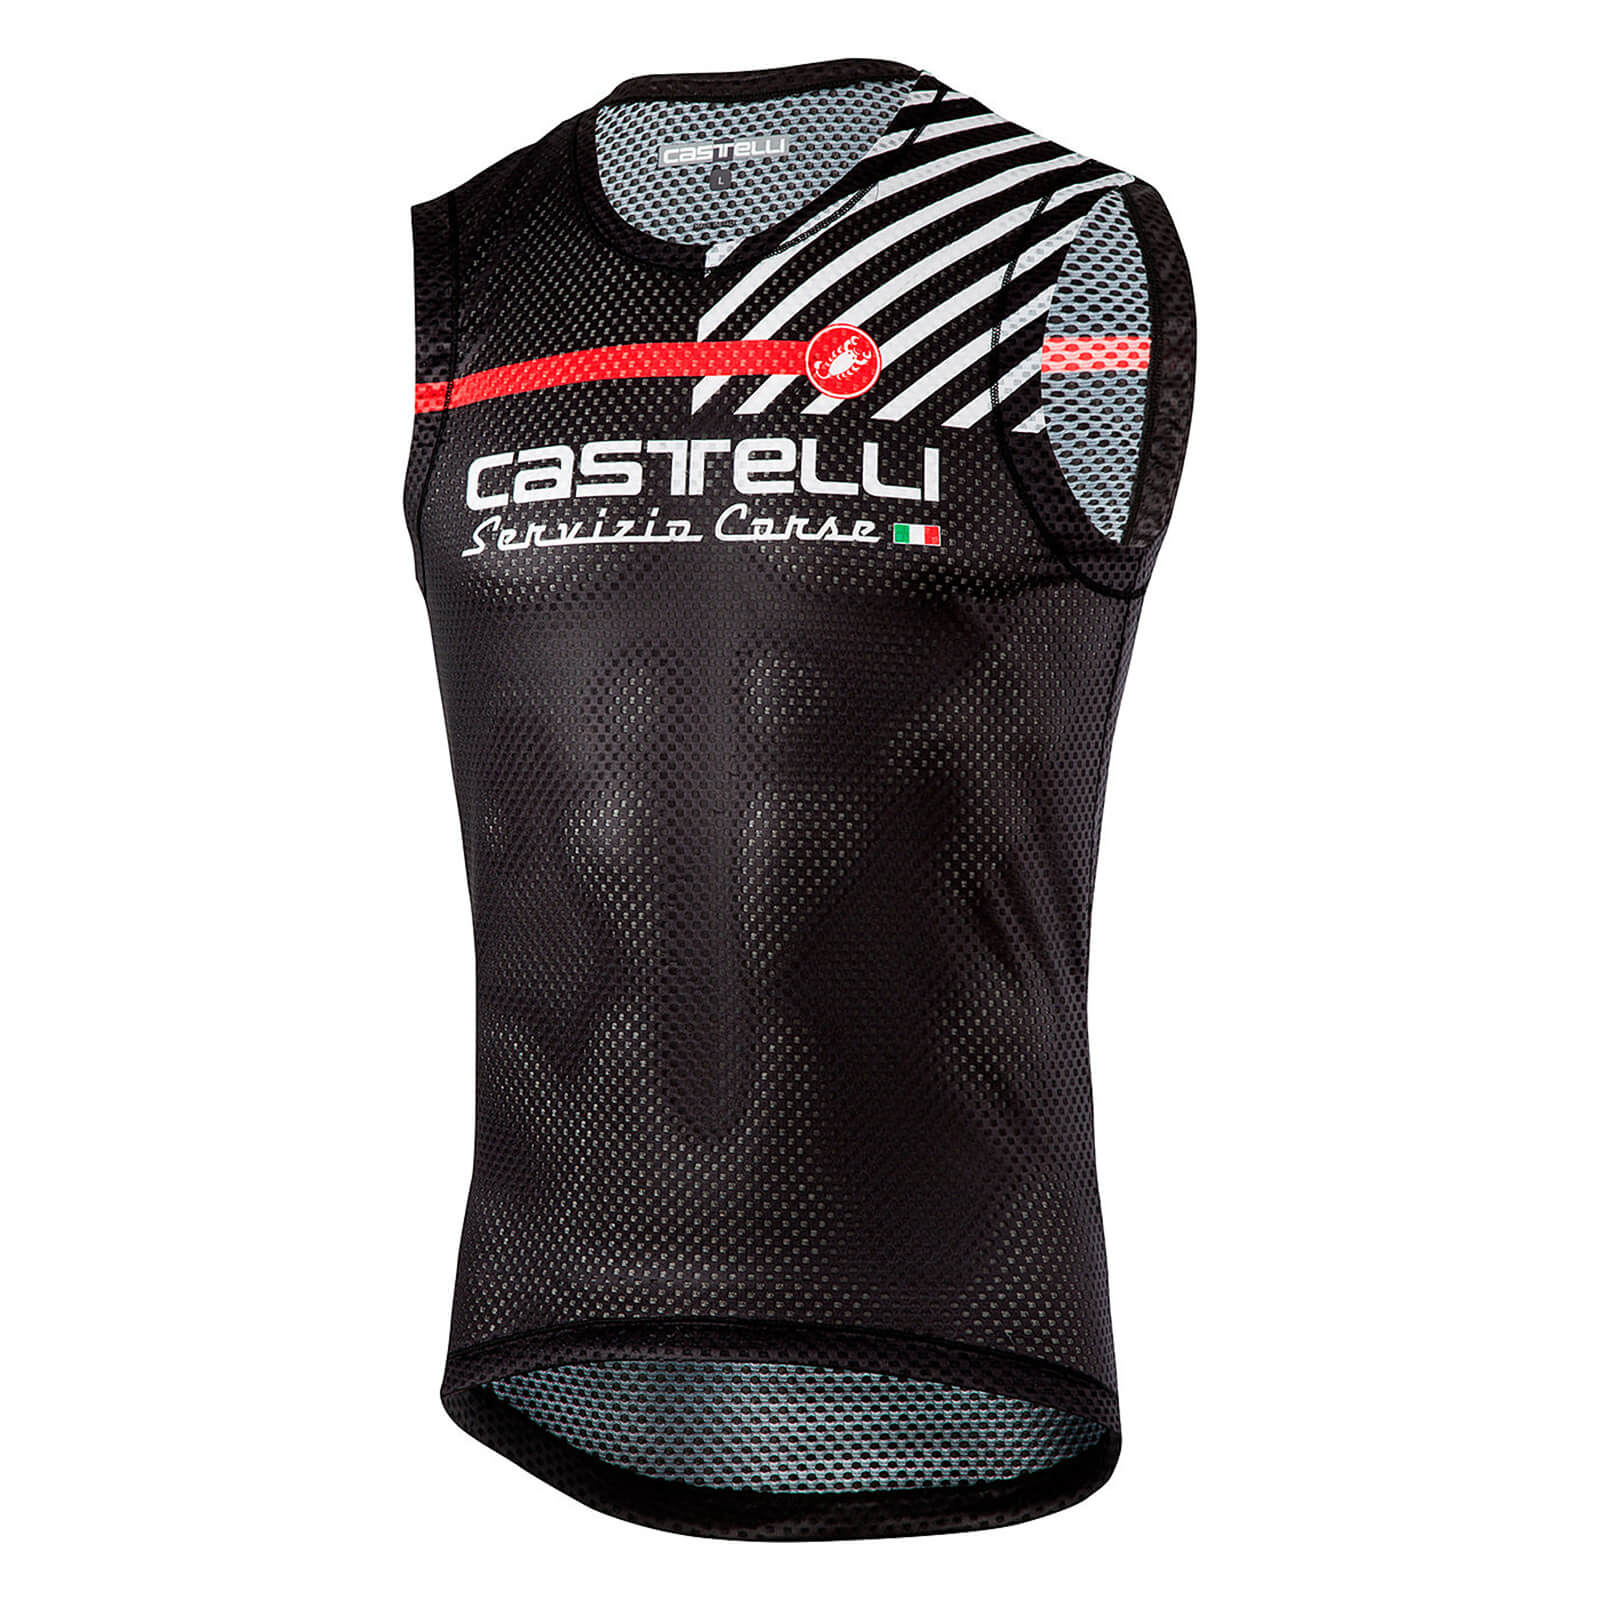 Castelli Women's Pro Mesh Sleeveless Jersey - M